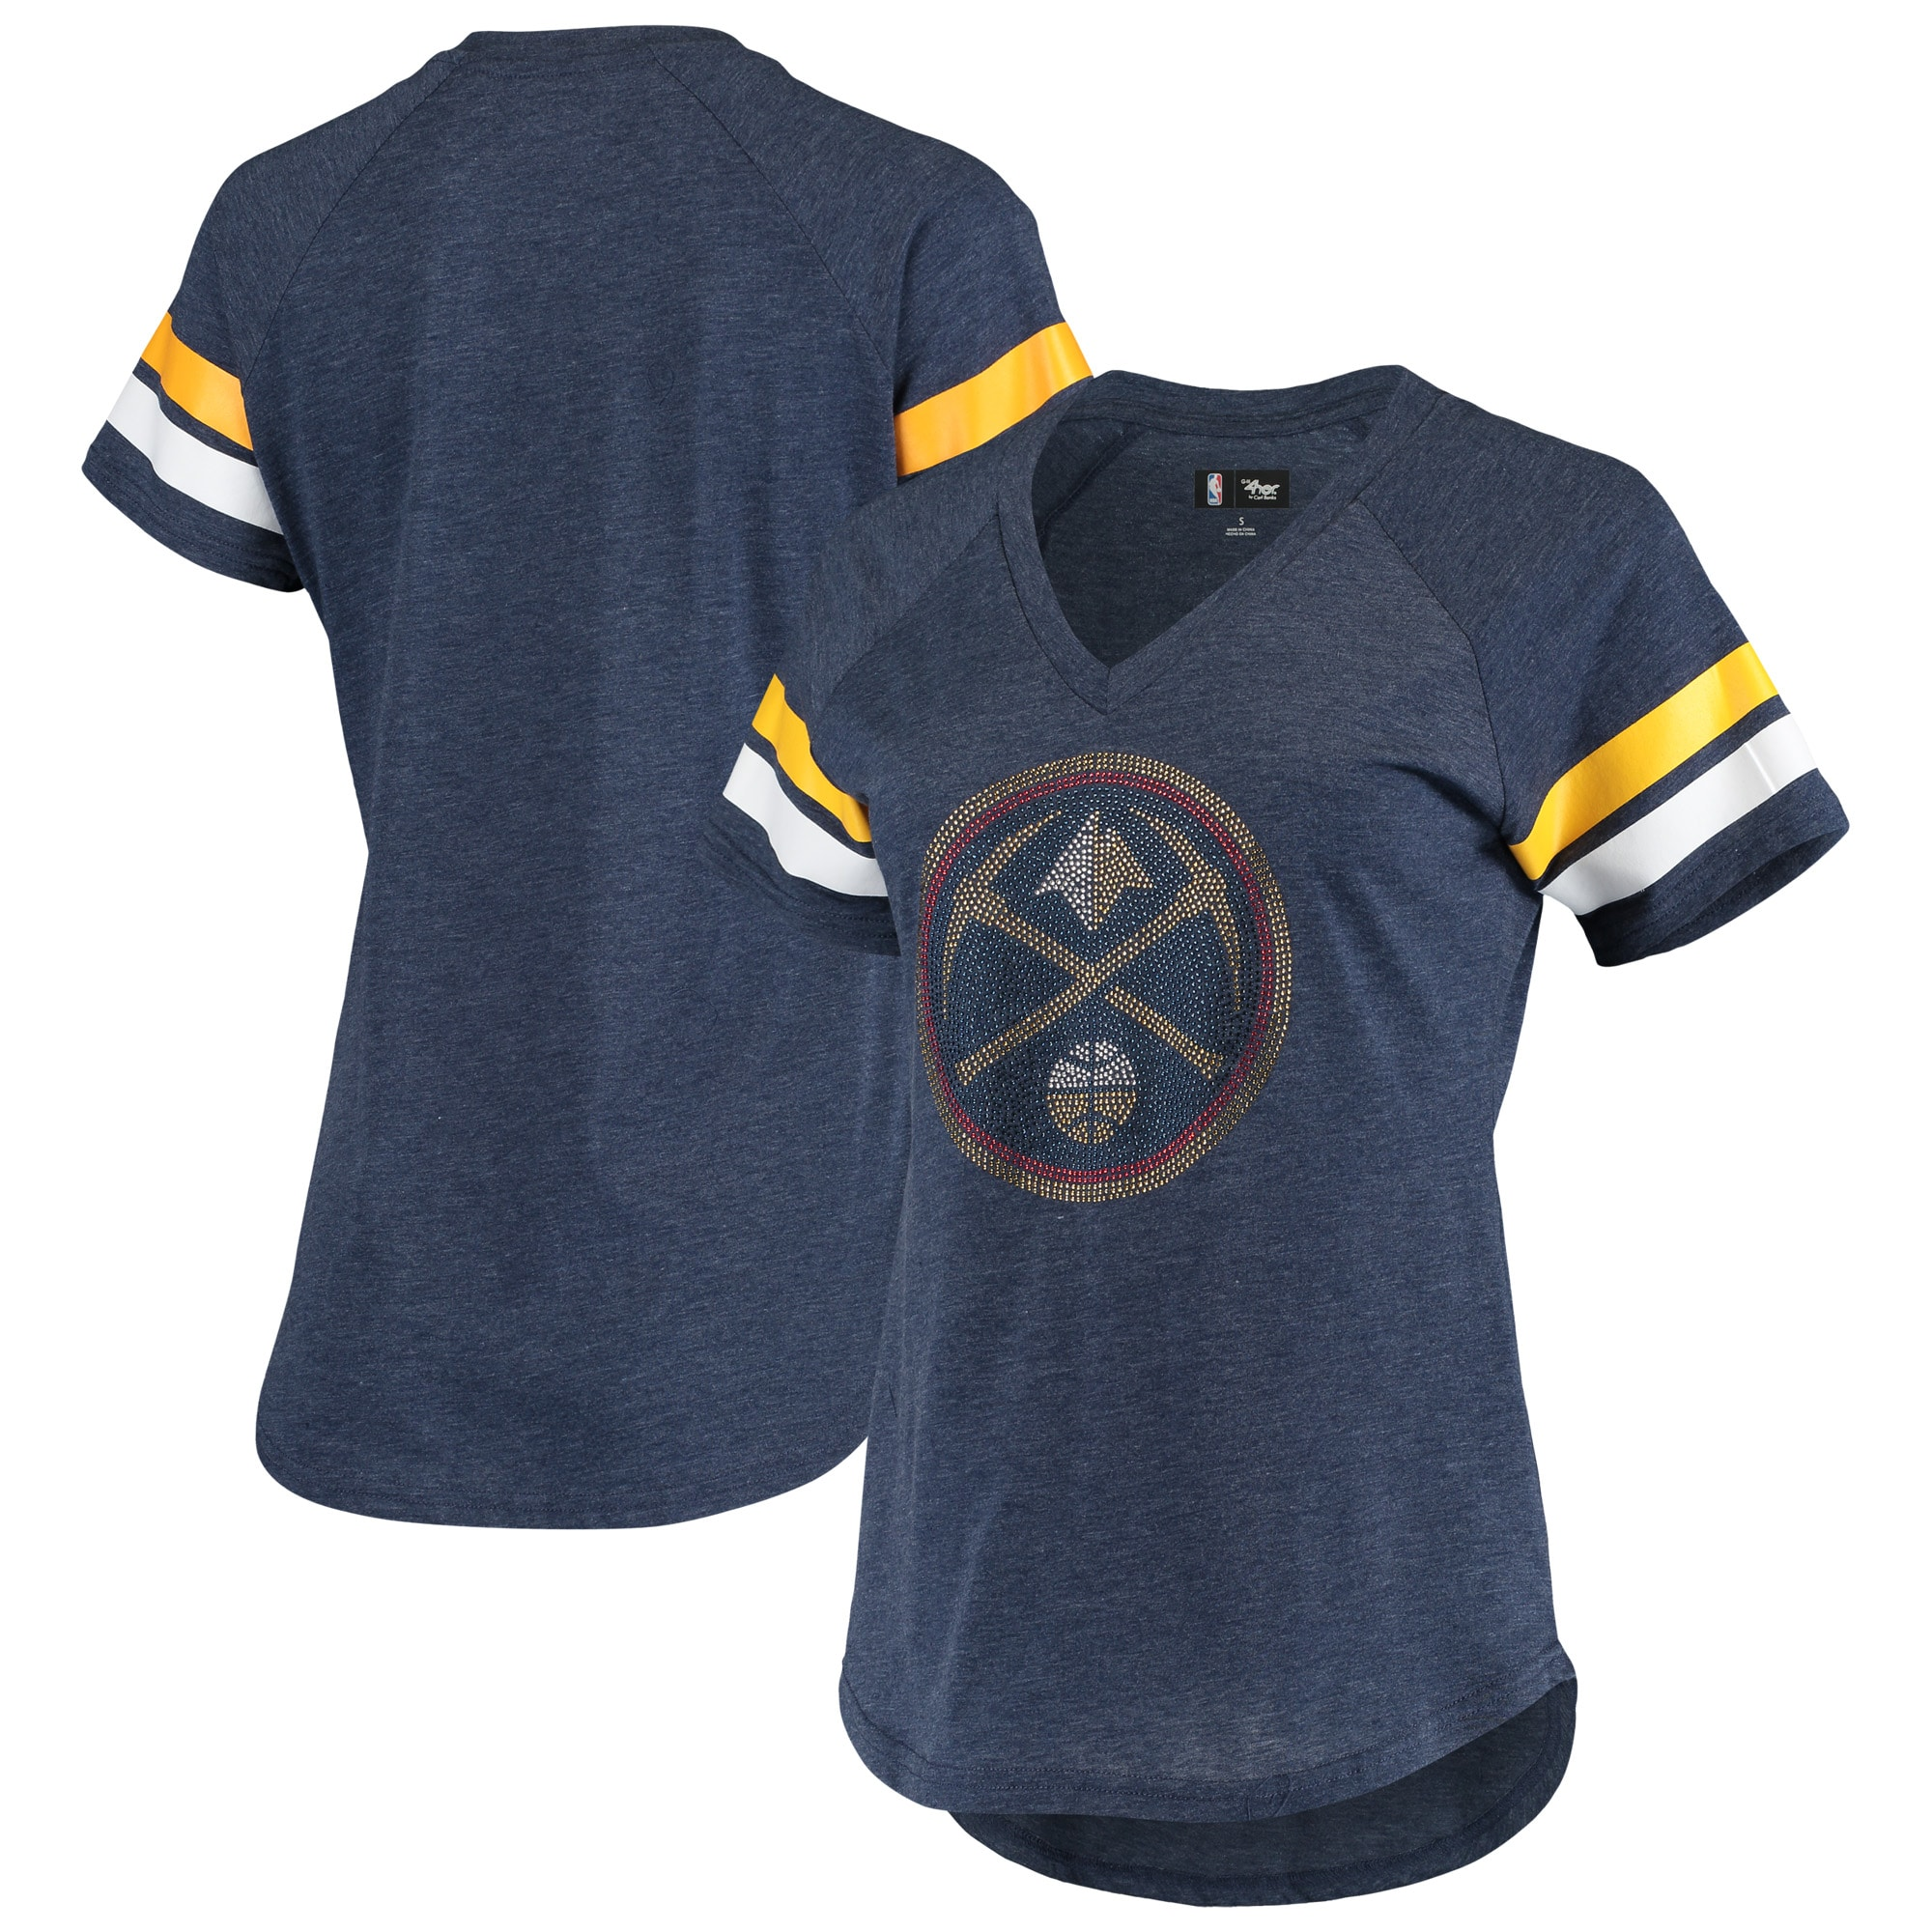 Denver Nuggets G-III 4Her by Carl Banks Women's Triple Double Rhinestone Tri-Blend V-Neck T-Shirt - Navy